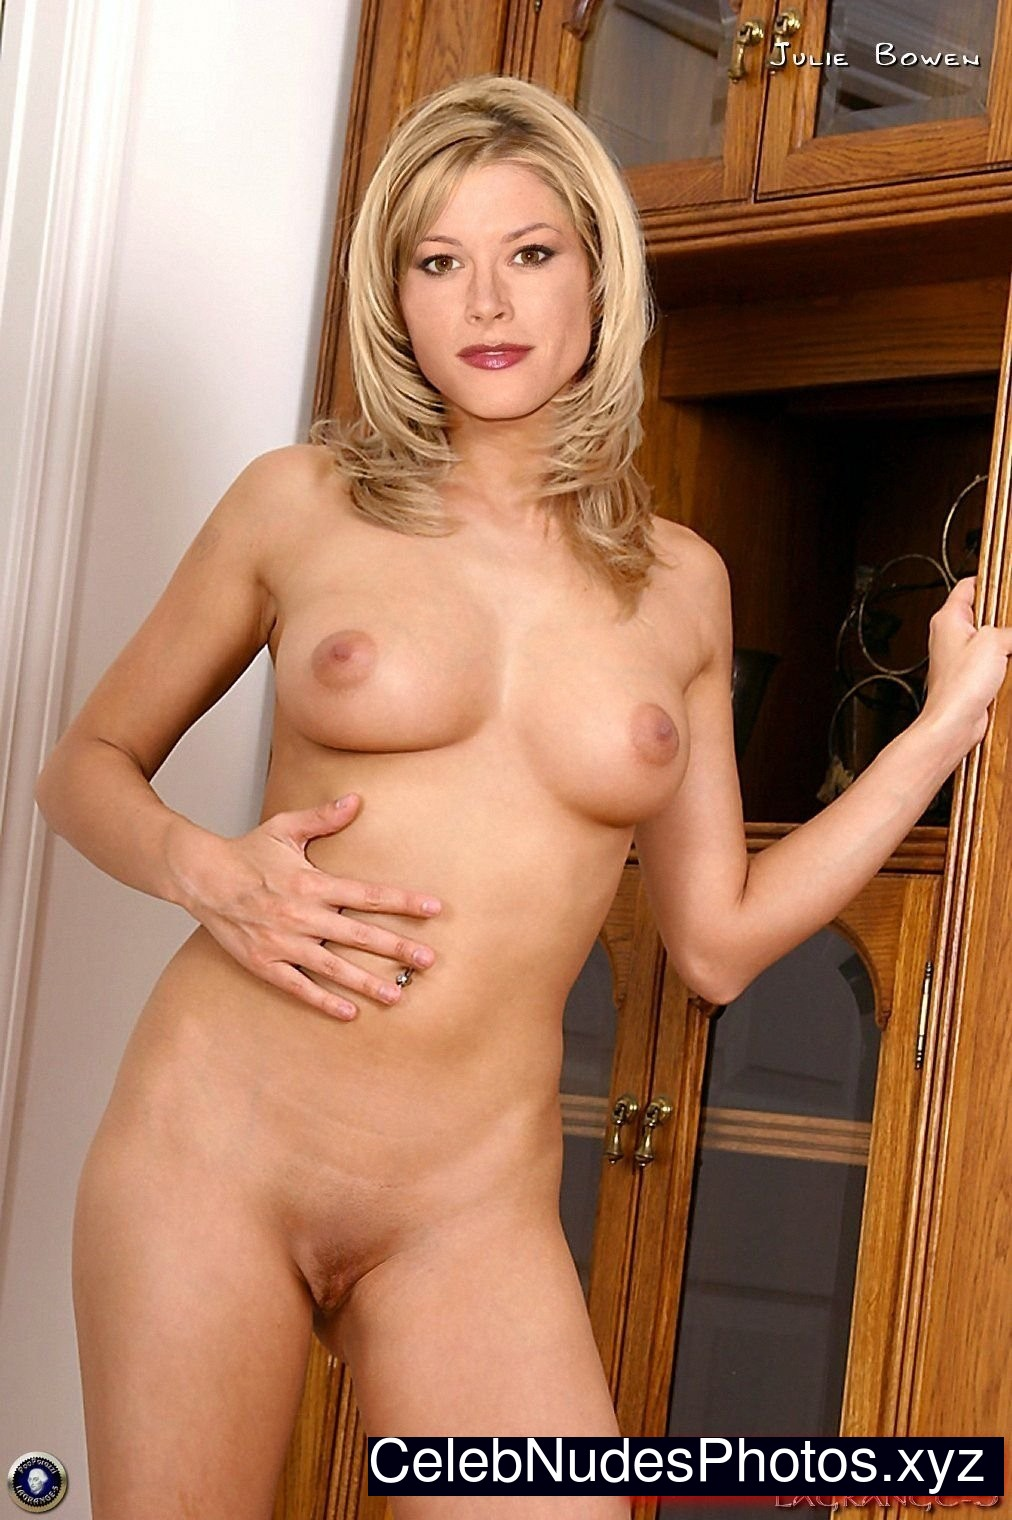 julie bowen nude photos